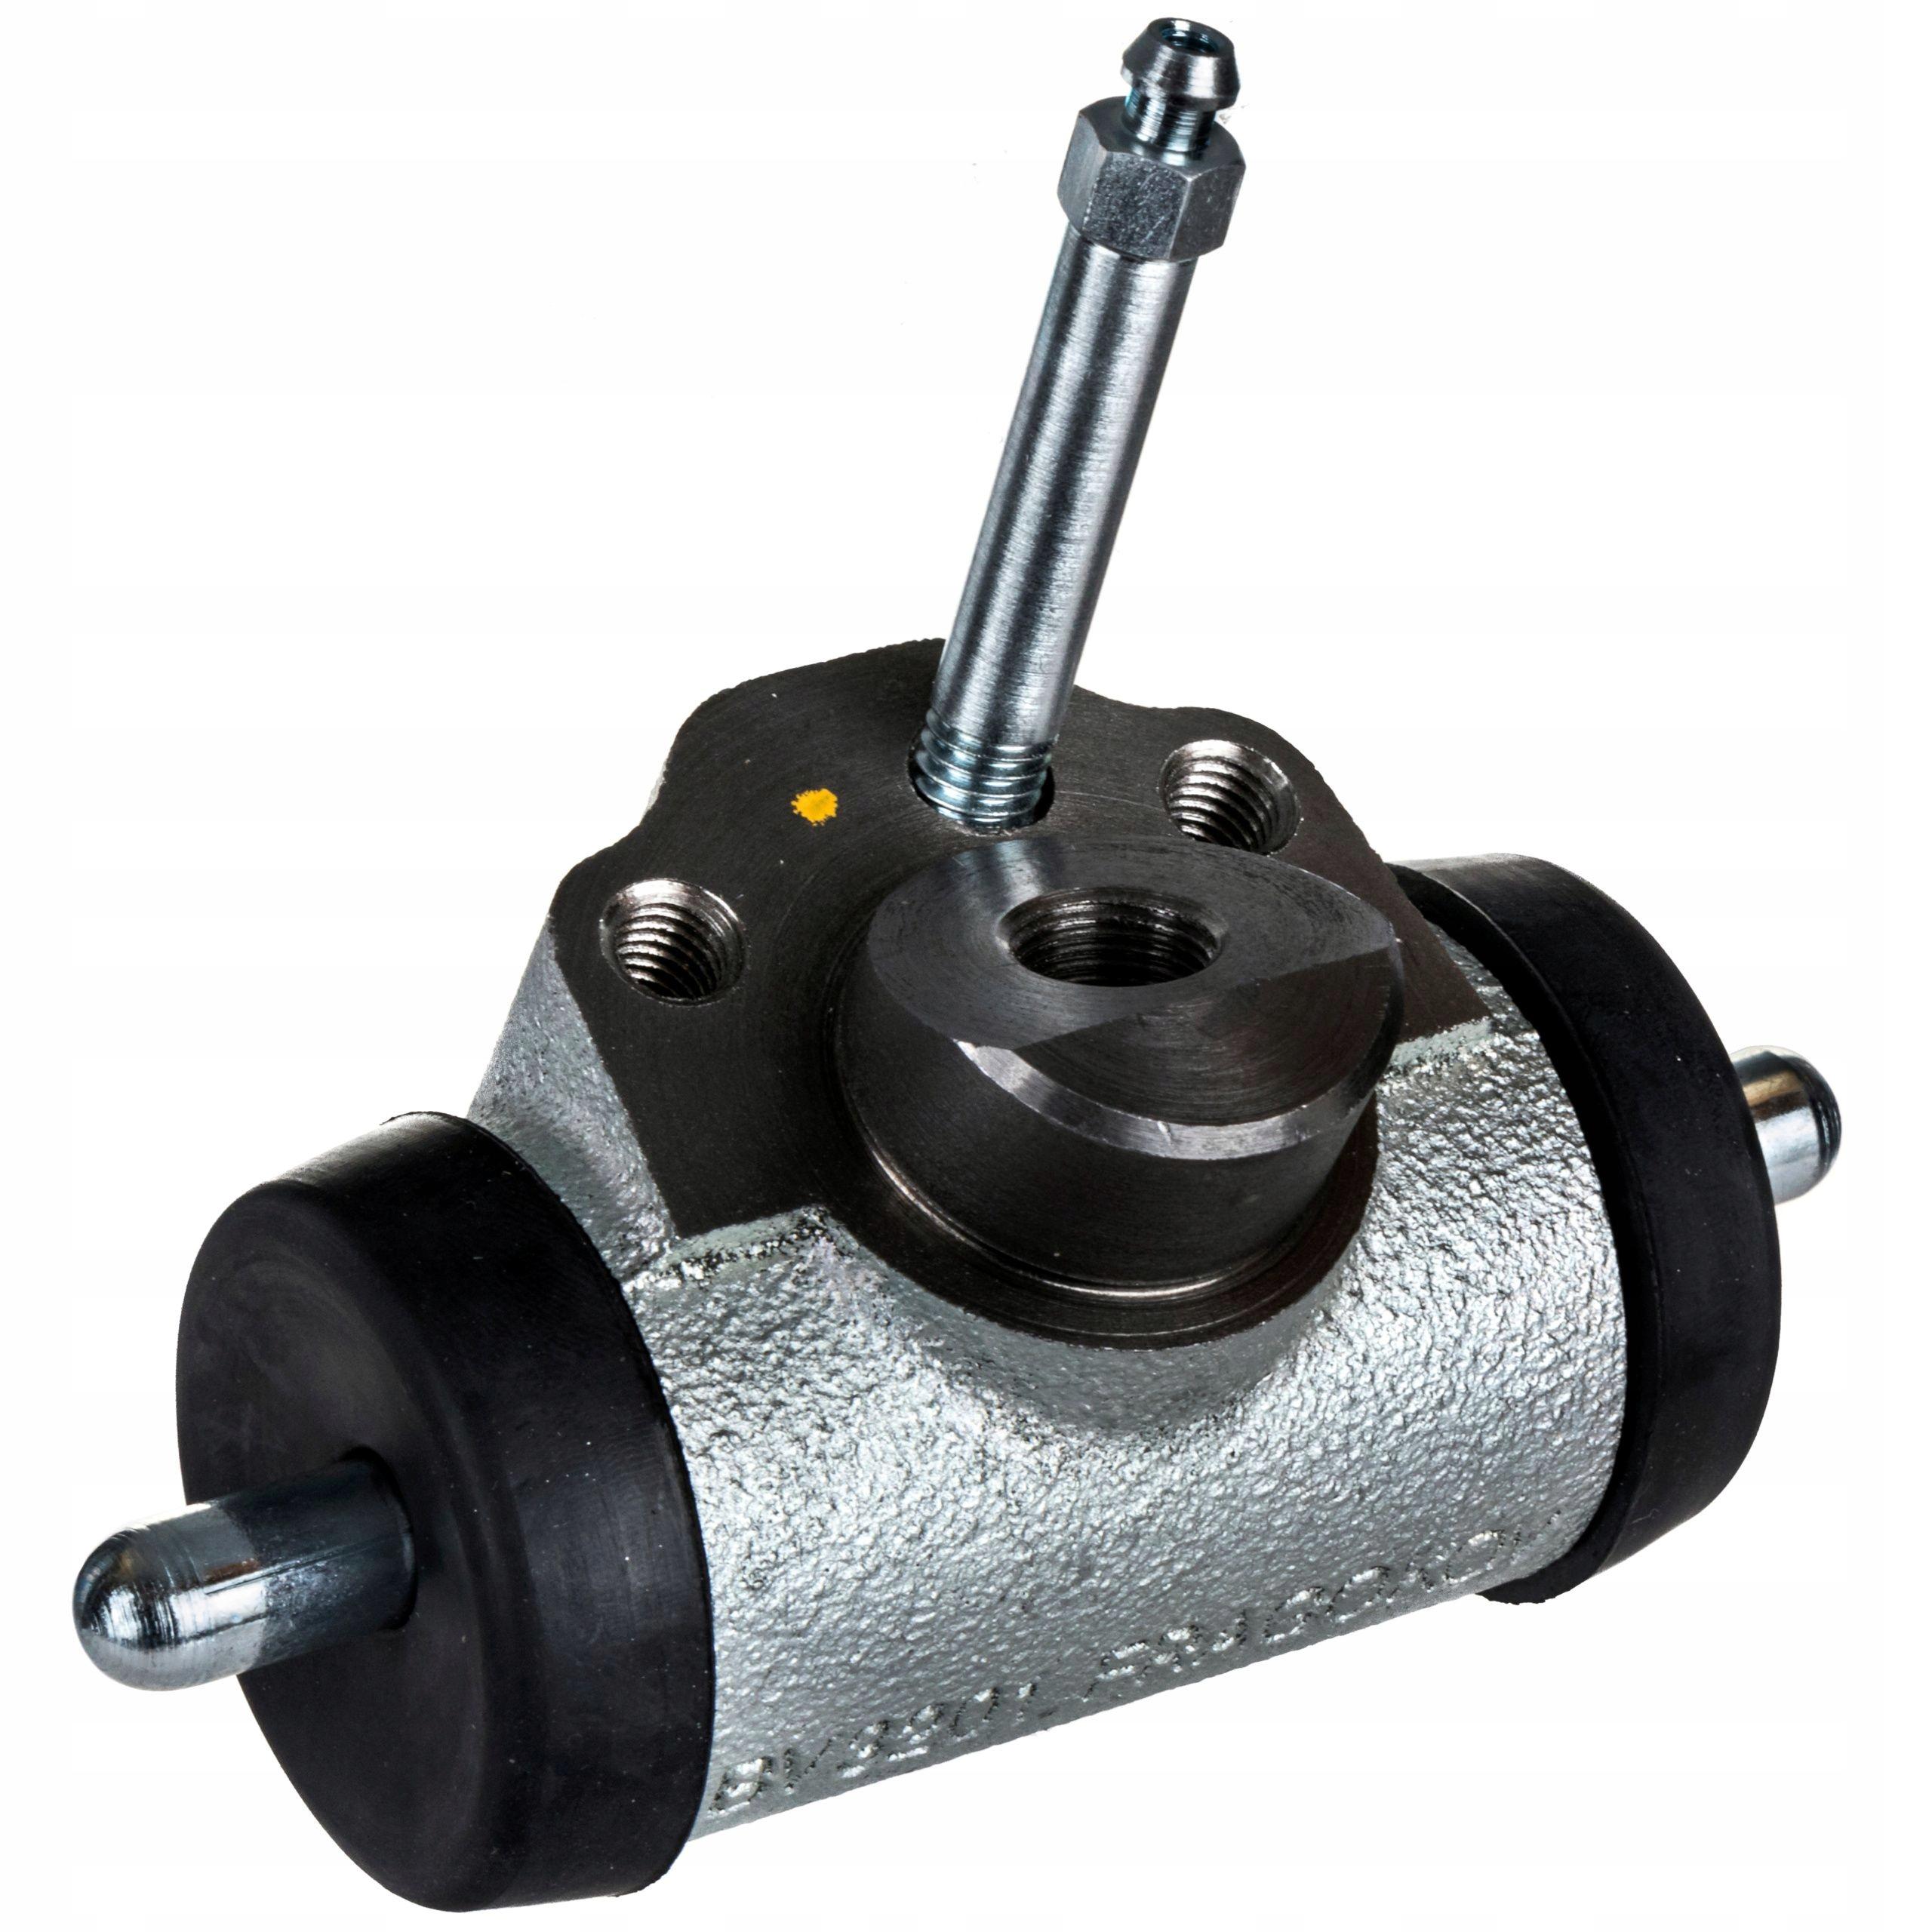 Cylinderek Hamulca C 360 C360 Czeski 50526200 Rzeczyca Ksieza Allegro Pl